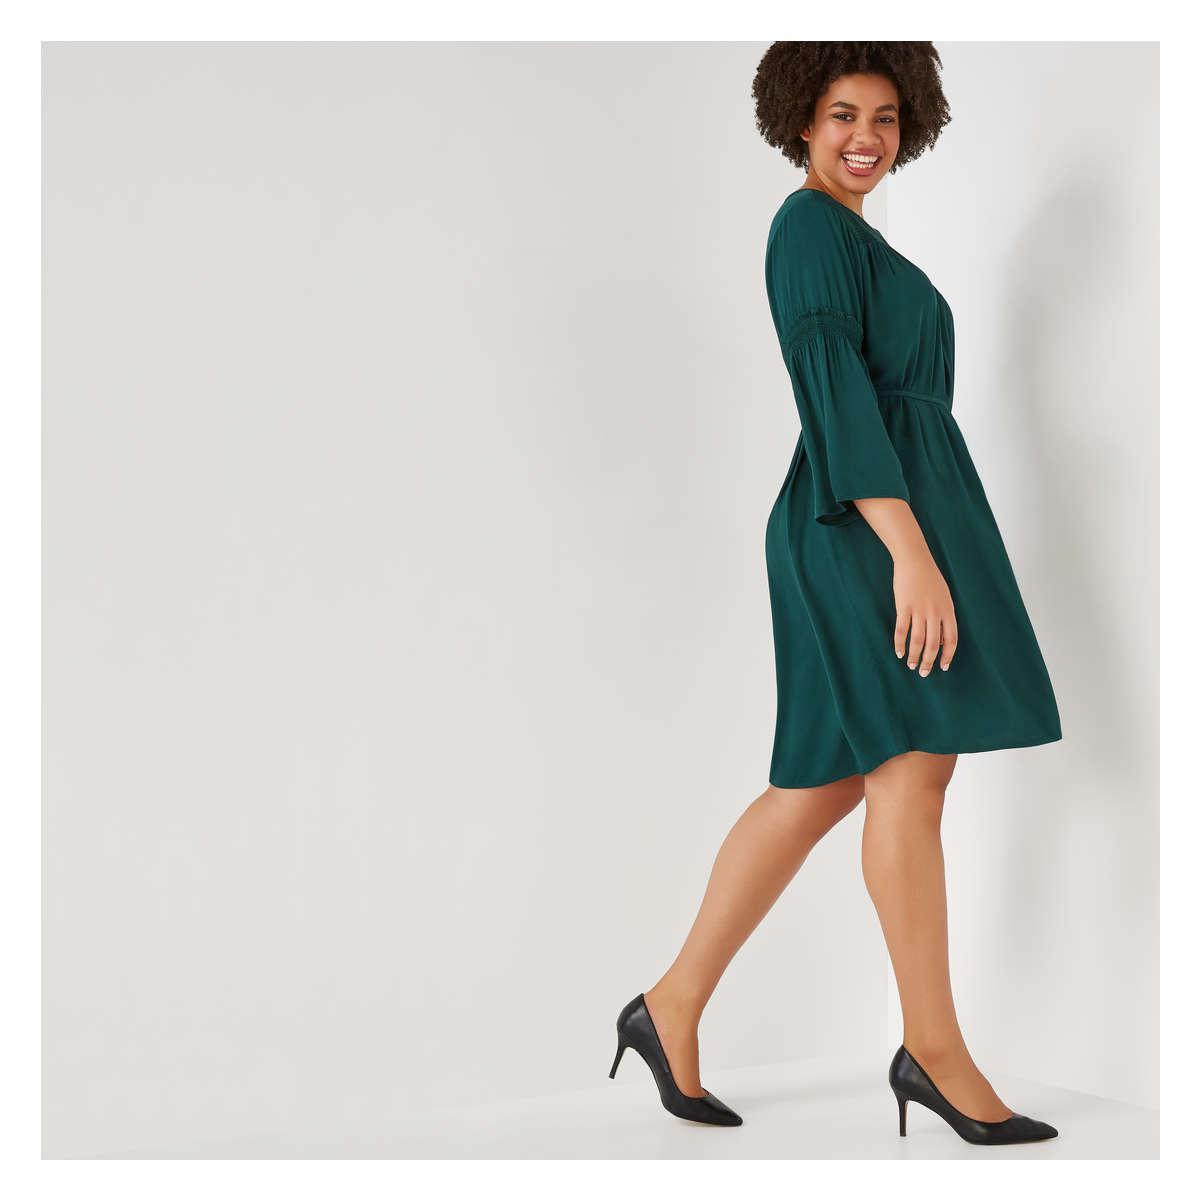 326b6639c74eb1 Joe Fresh - Green Women+ Smocked Dress - Lyst. View fullscreen